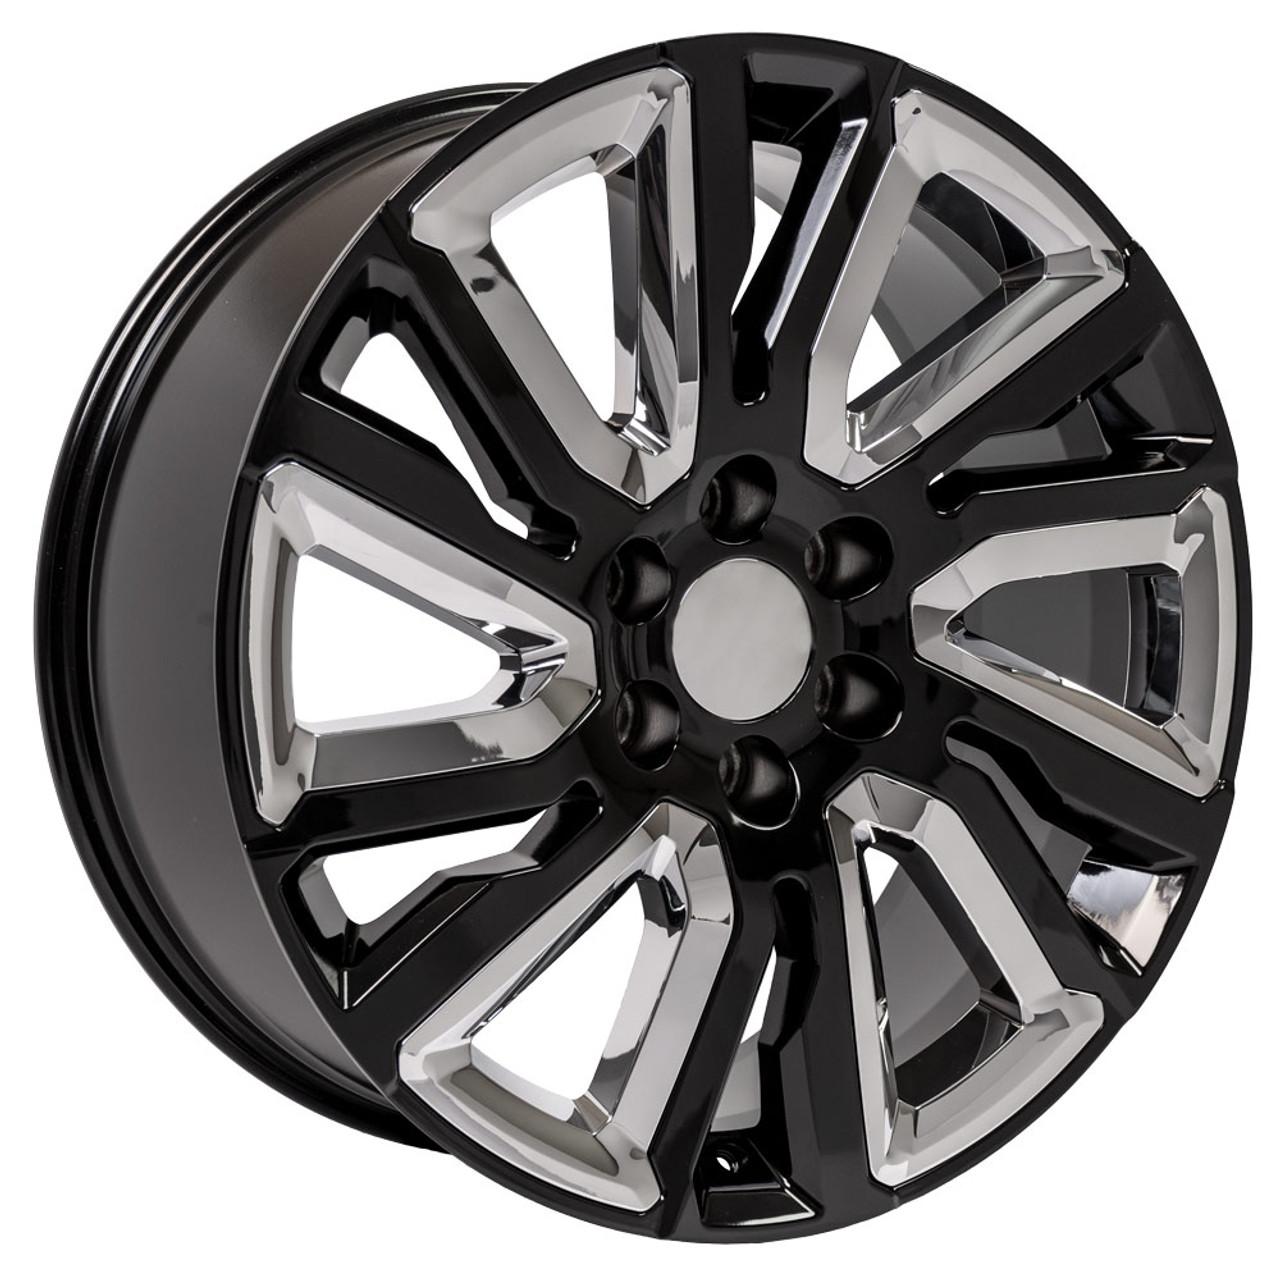 wheels rims gmc chrome sierra inch wheel 1500 replica chevy cv39 gloss denali yukon silverado insert rim inserts chevrolet 22x9